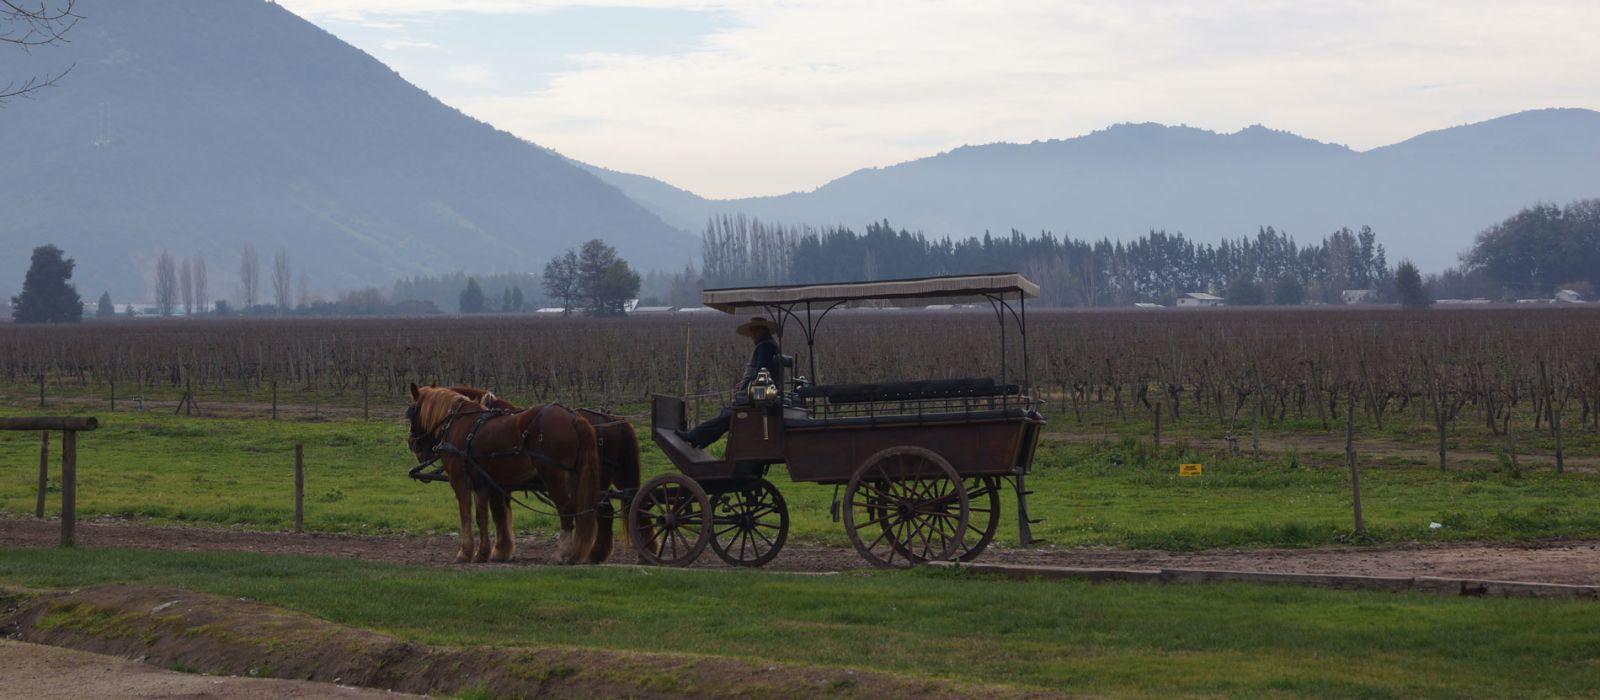 Reiseziel Colchagua Chile